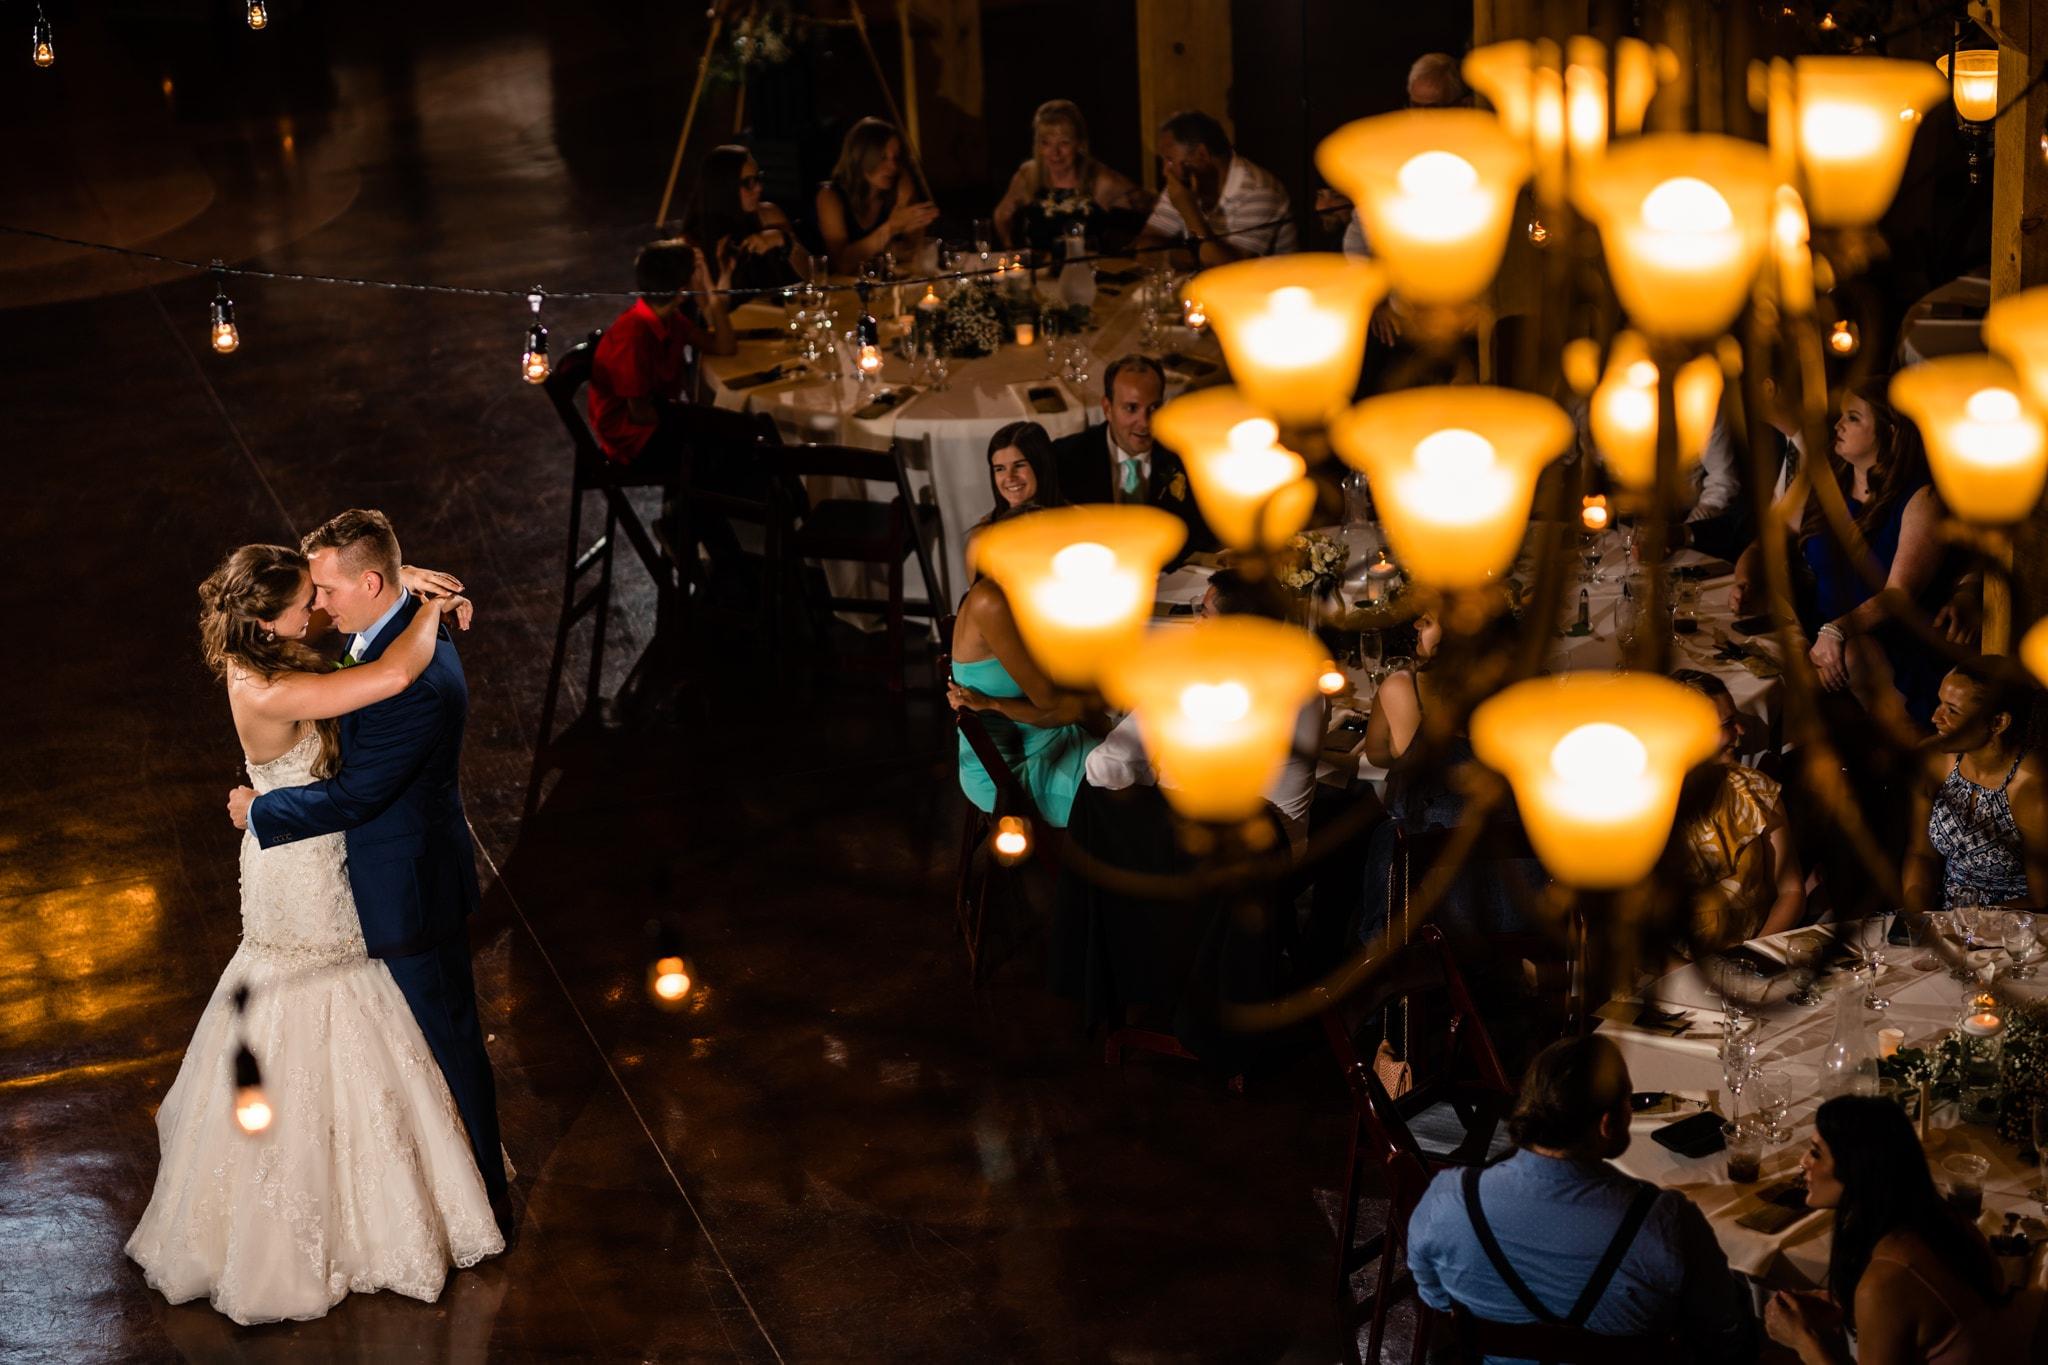 First Dances at Weddings - Ohio Barn Wedding